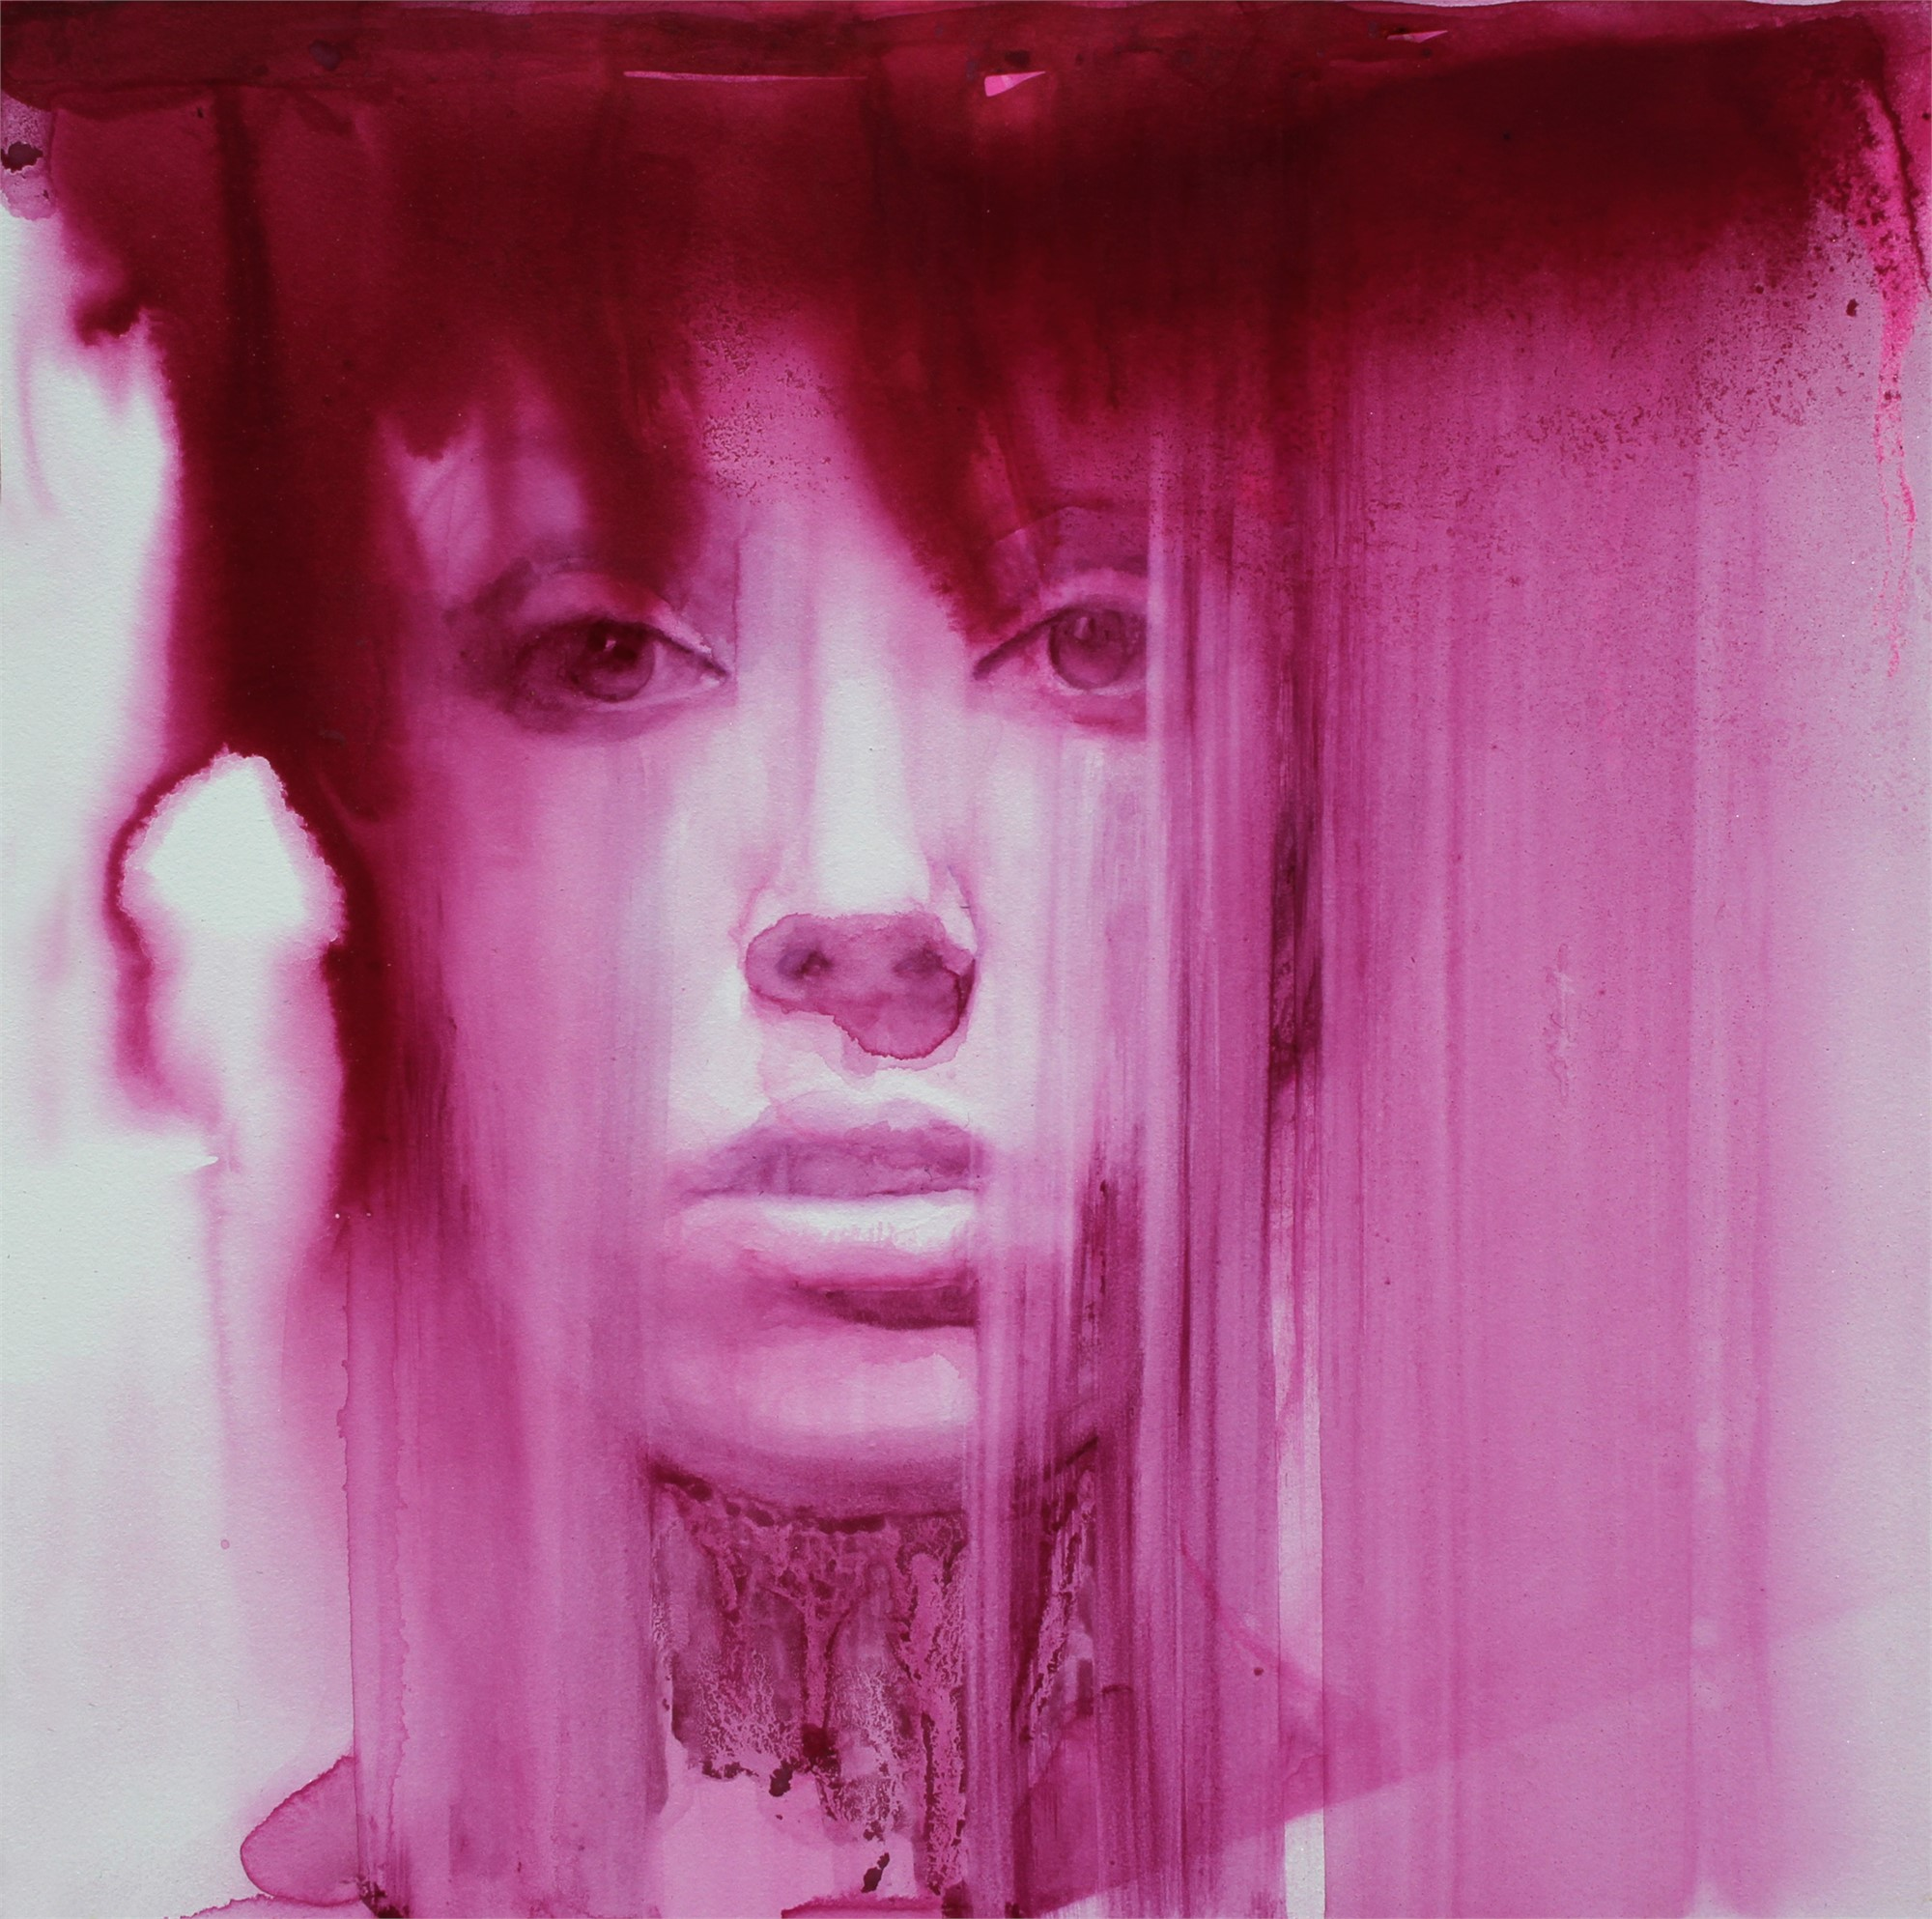 Gush by Ali Cavanaugh